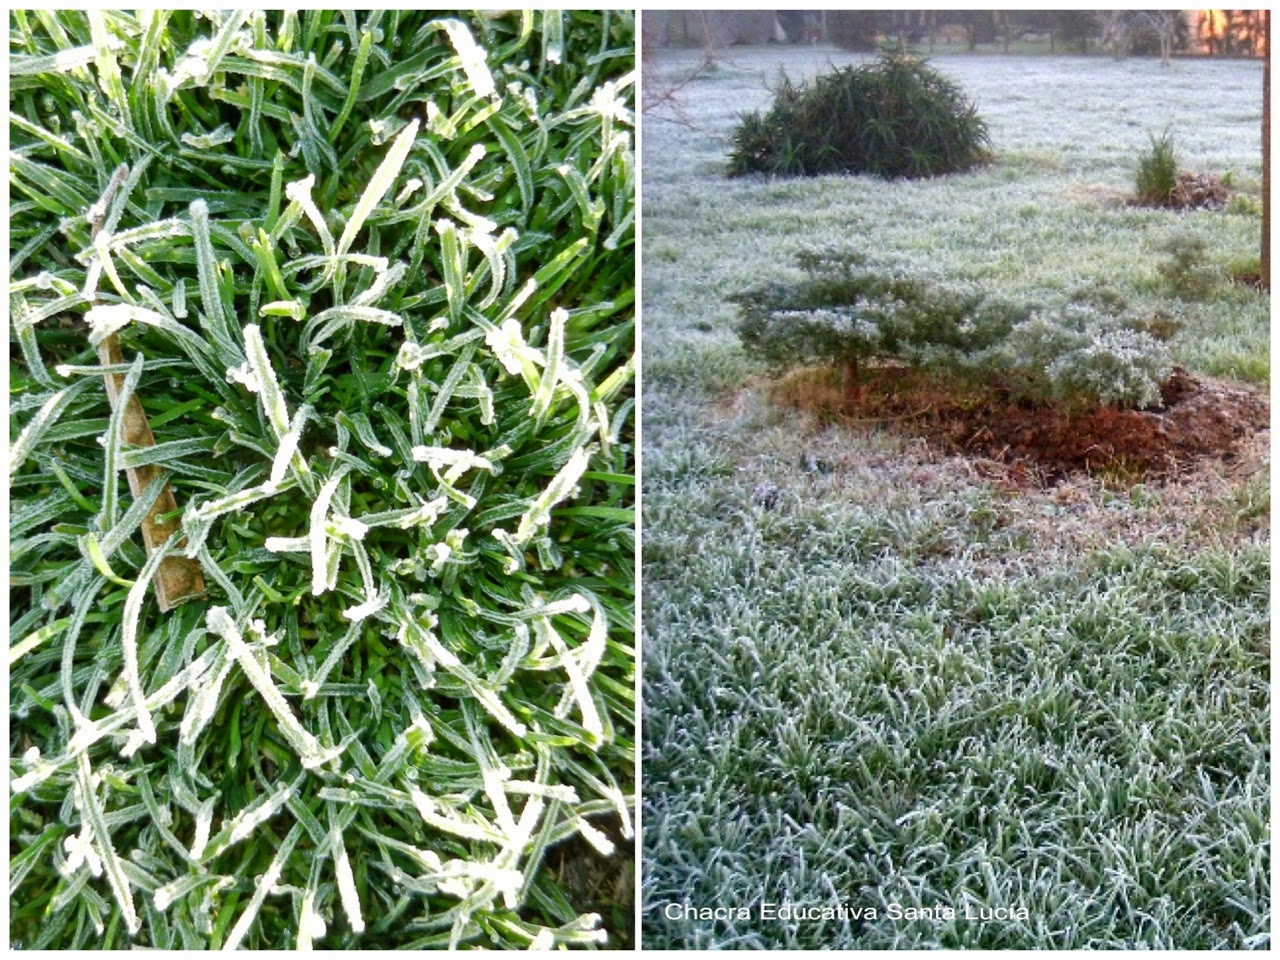 helada - ground frost - Chacra Educativa Santa Lucía